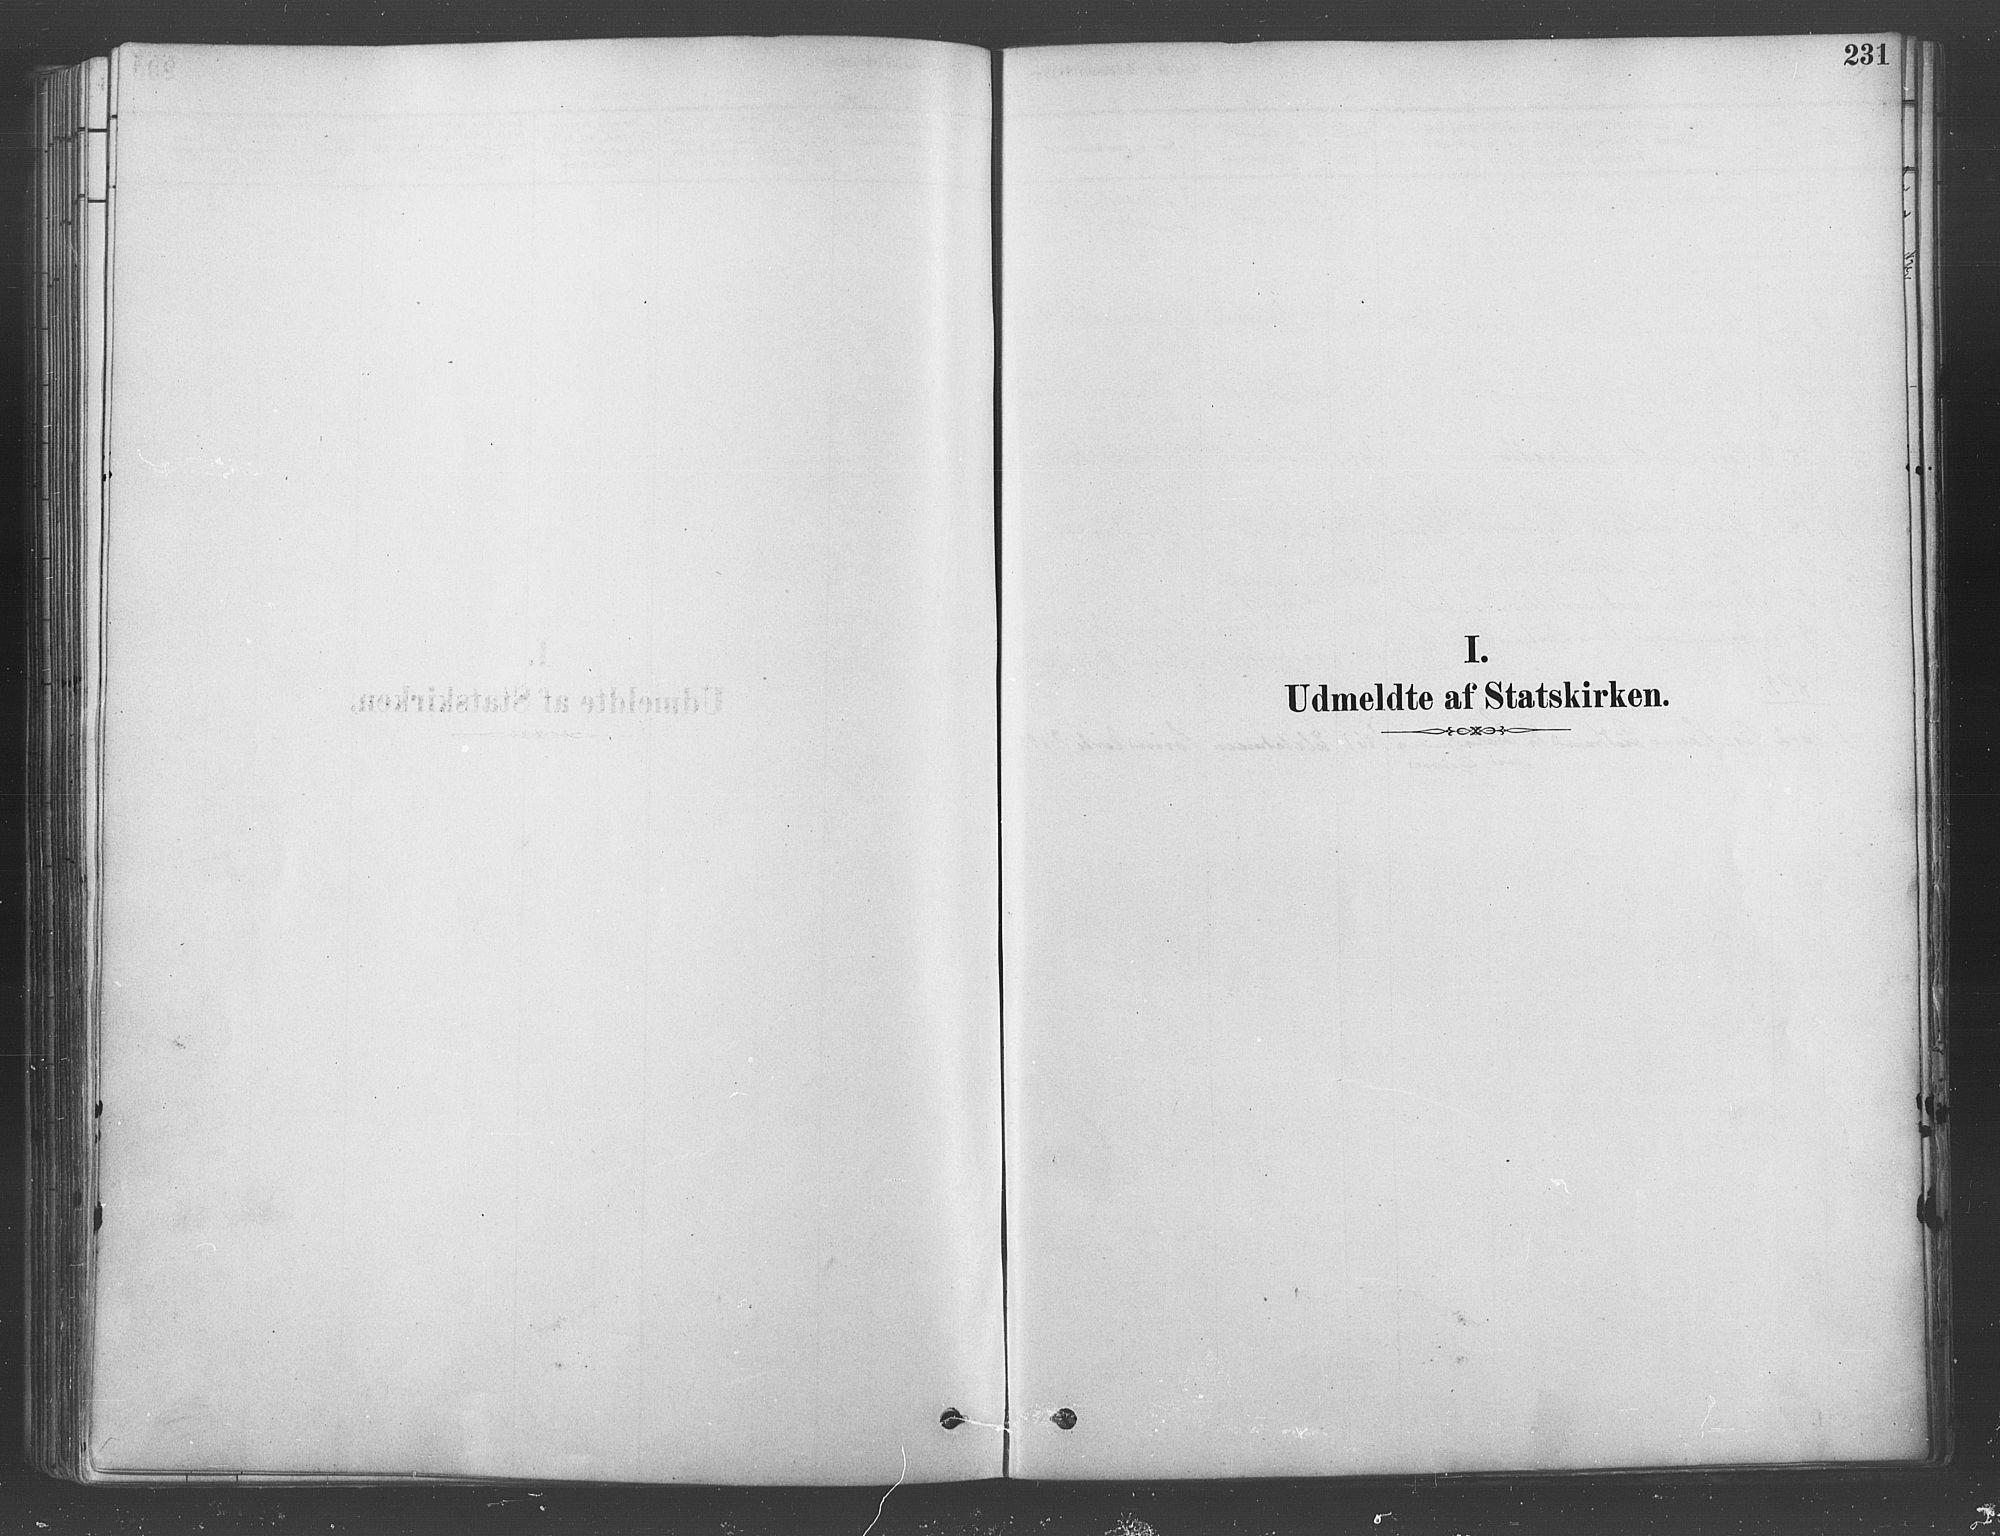 SAO, Ullensaker prestekontor Kirkebøker, F/Fb/L0001: Ministerialbok nr. II 1, 1878-1893, s. 231